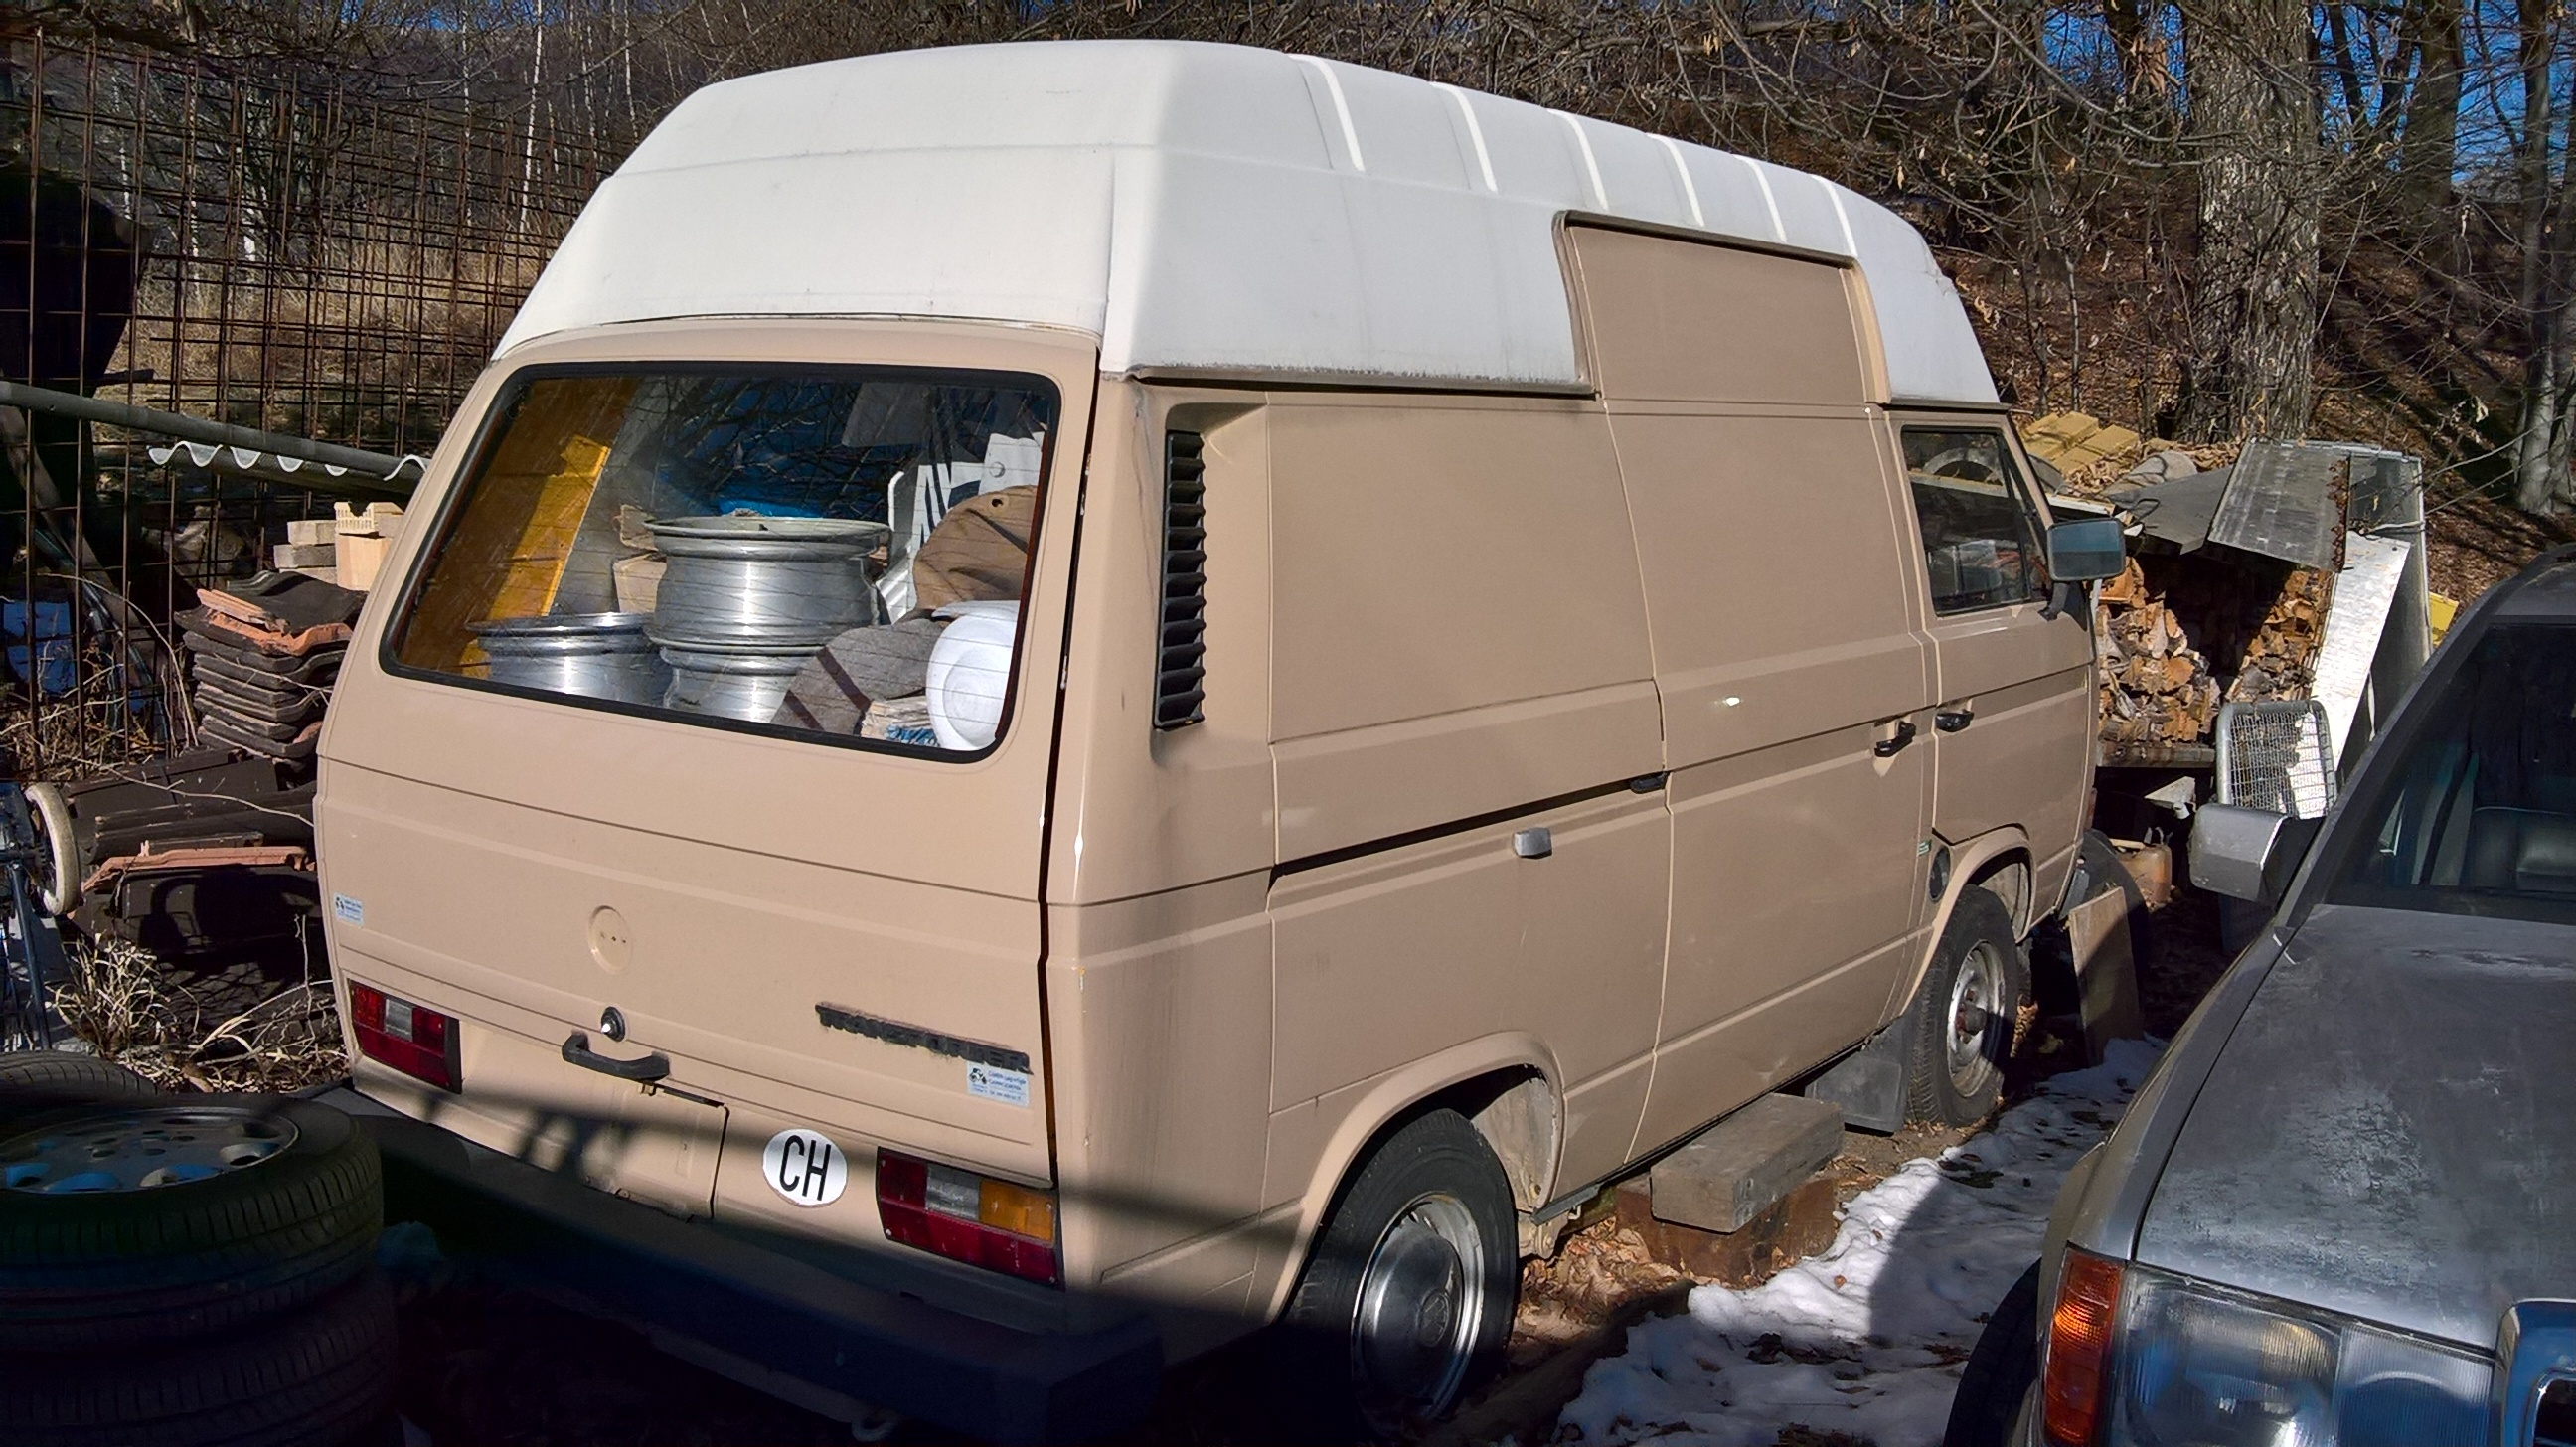 vw t3 transporter 9 pl tzer verkauft neu postbus zu verkaufen biete vwbusforum ch. Black Bedroom Furniture Sets. Home Design Ideas